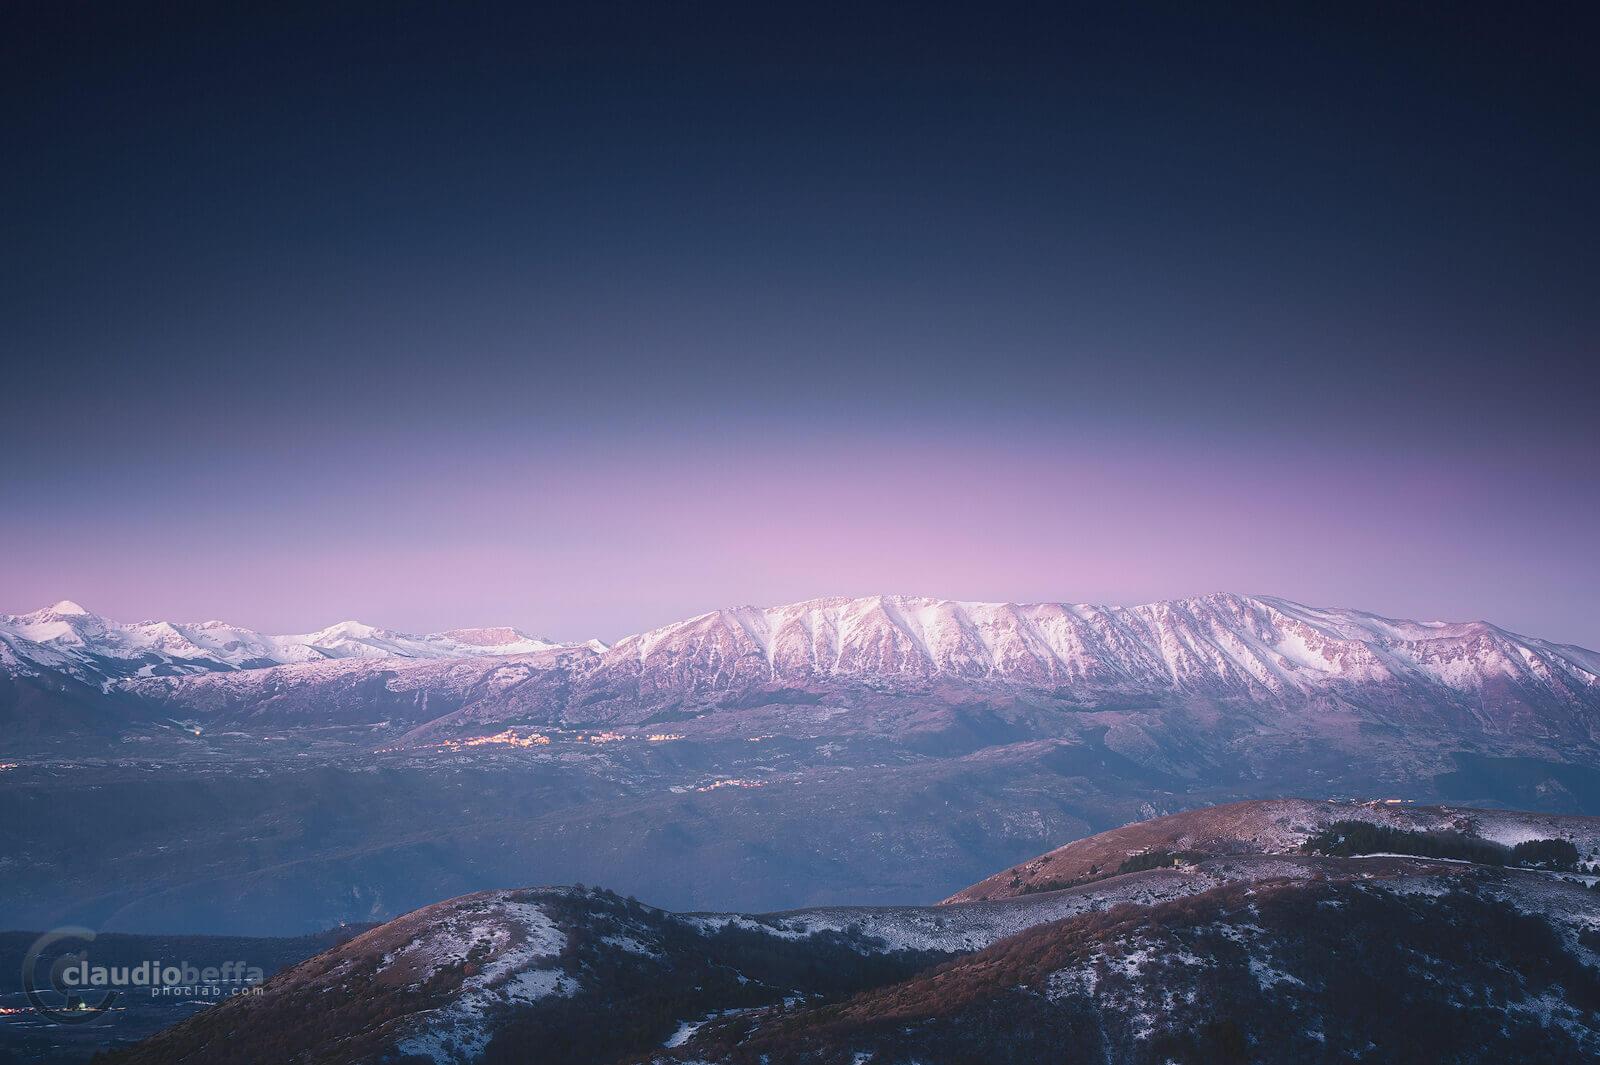 Dawn at high elevation, Abruzzo, Italy, Apennines, Rocca Calascio, Landscape, Twilight, Mountains, Snow, Nature